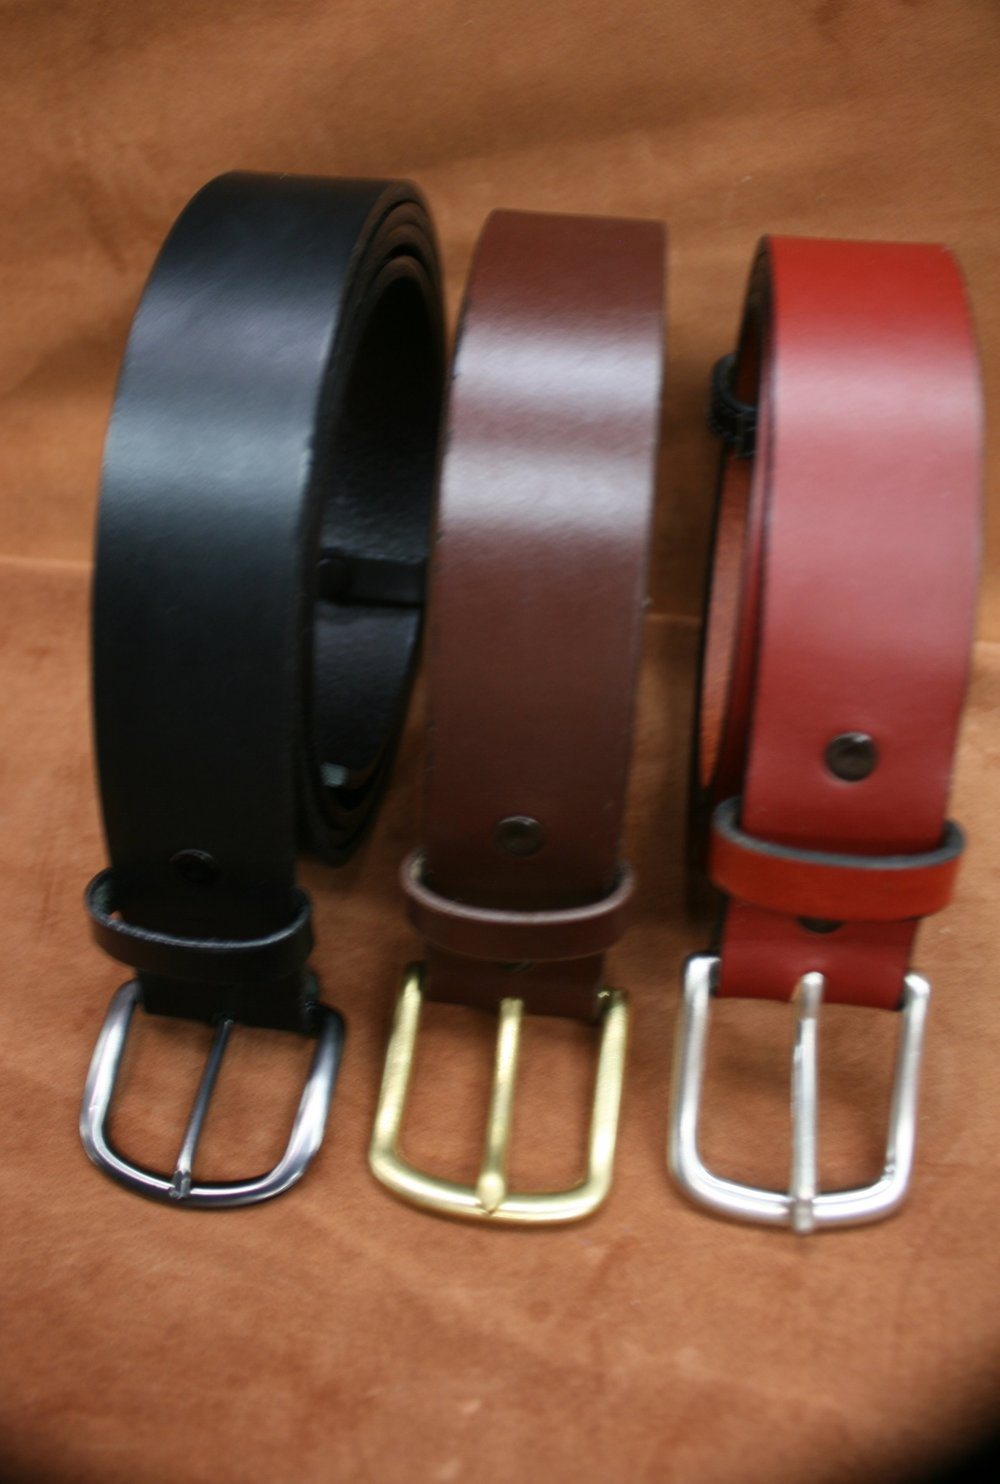 P-10 Classic Belt - $48